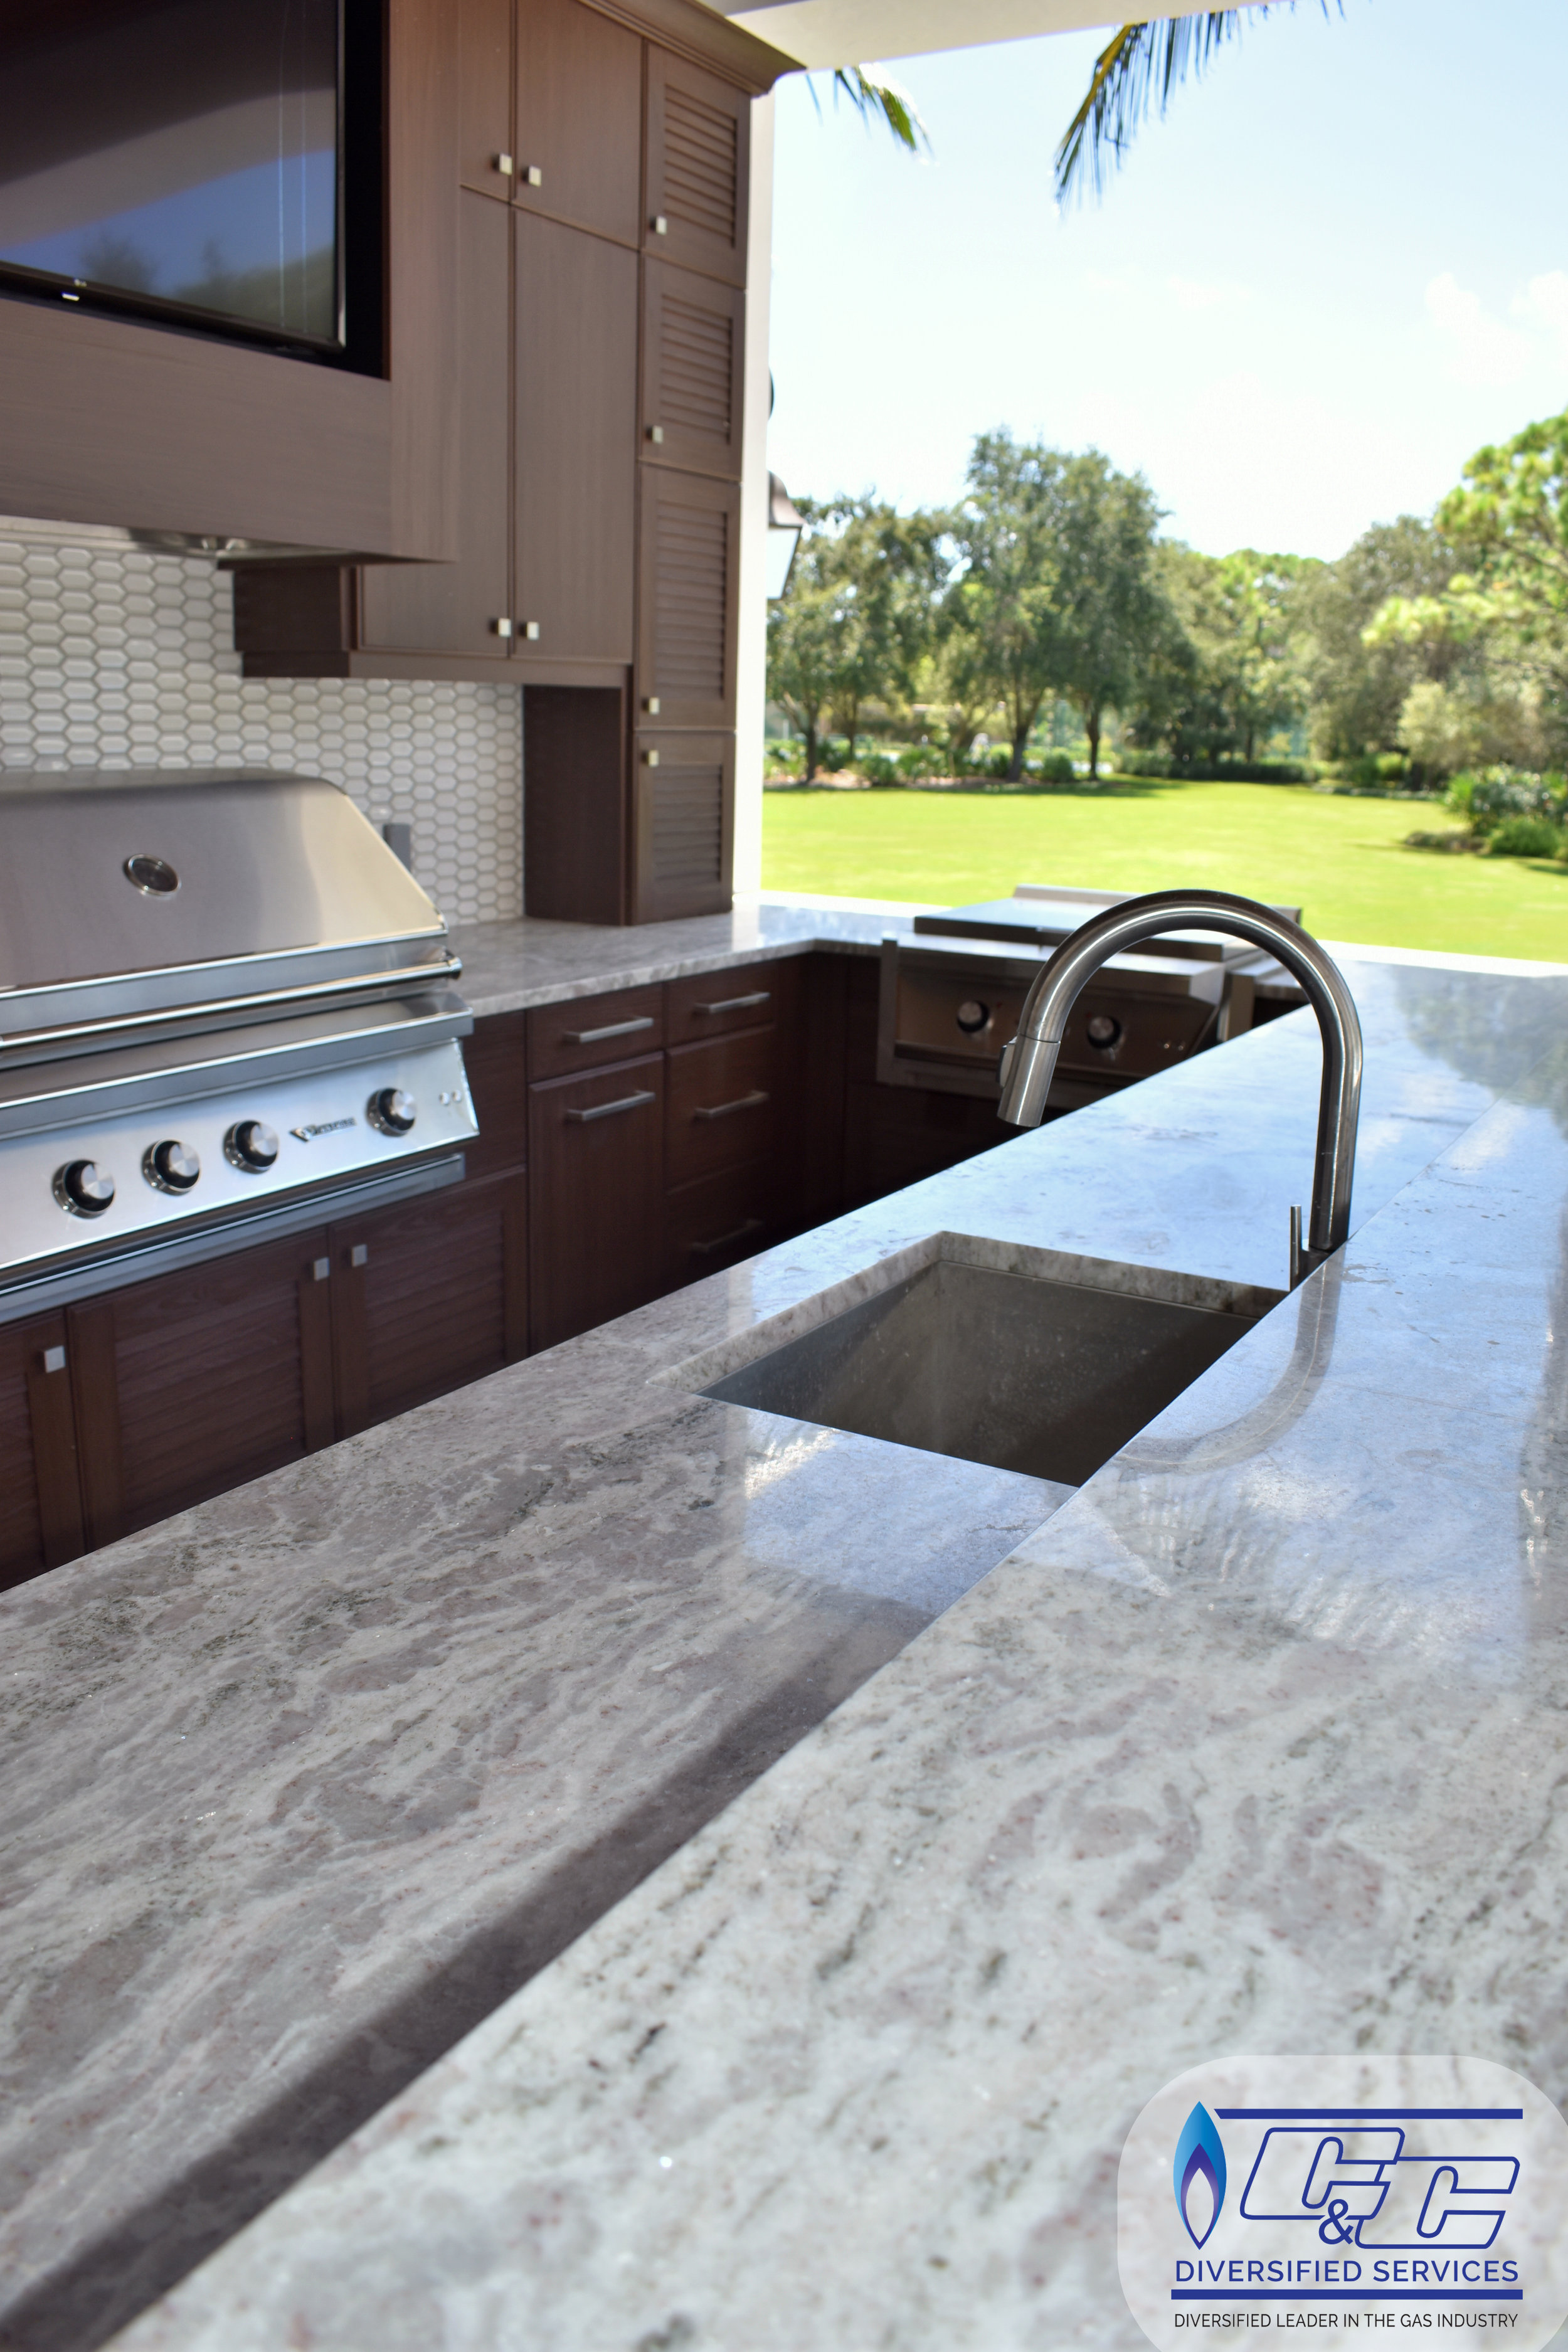 NatureKast Weatherproof Cabinetry - Undermount Stainless Steel Sink